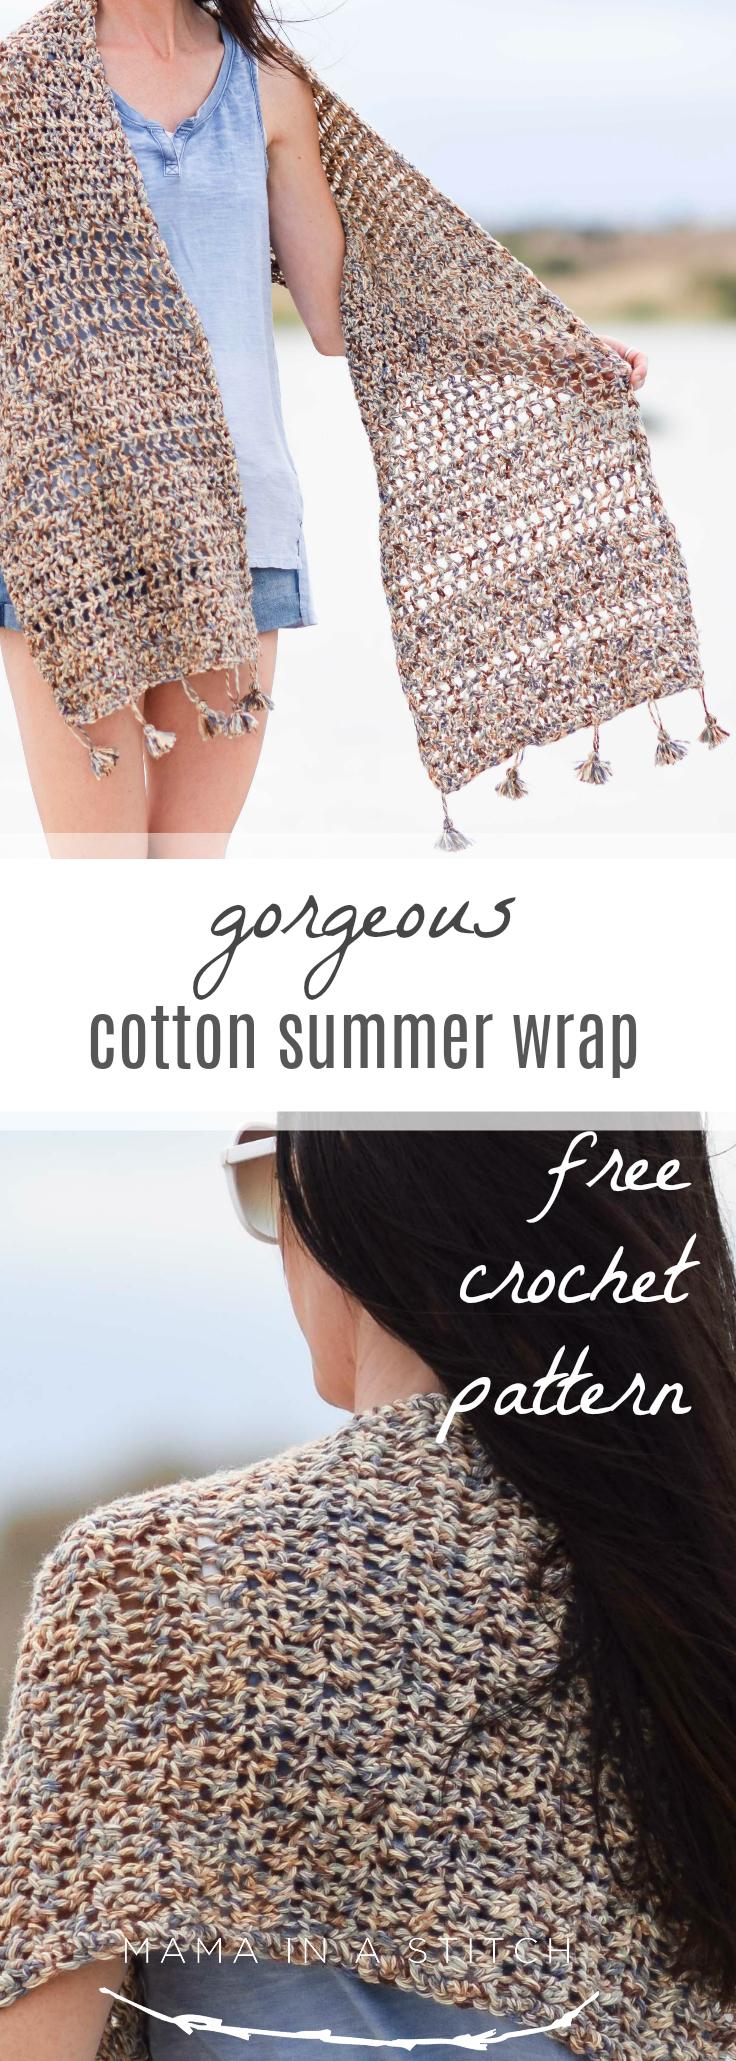 Wanders Wrap Summer Shawl Crochet Pattern Mama In A Stitch